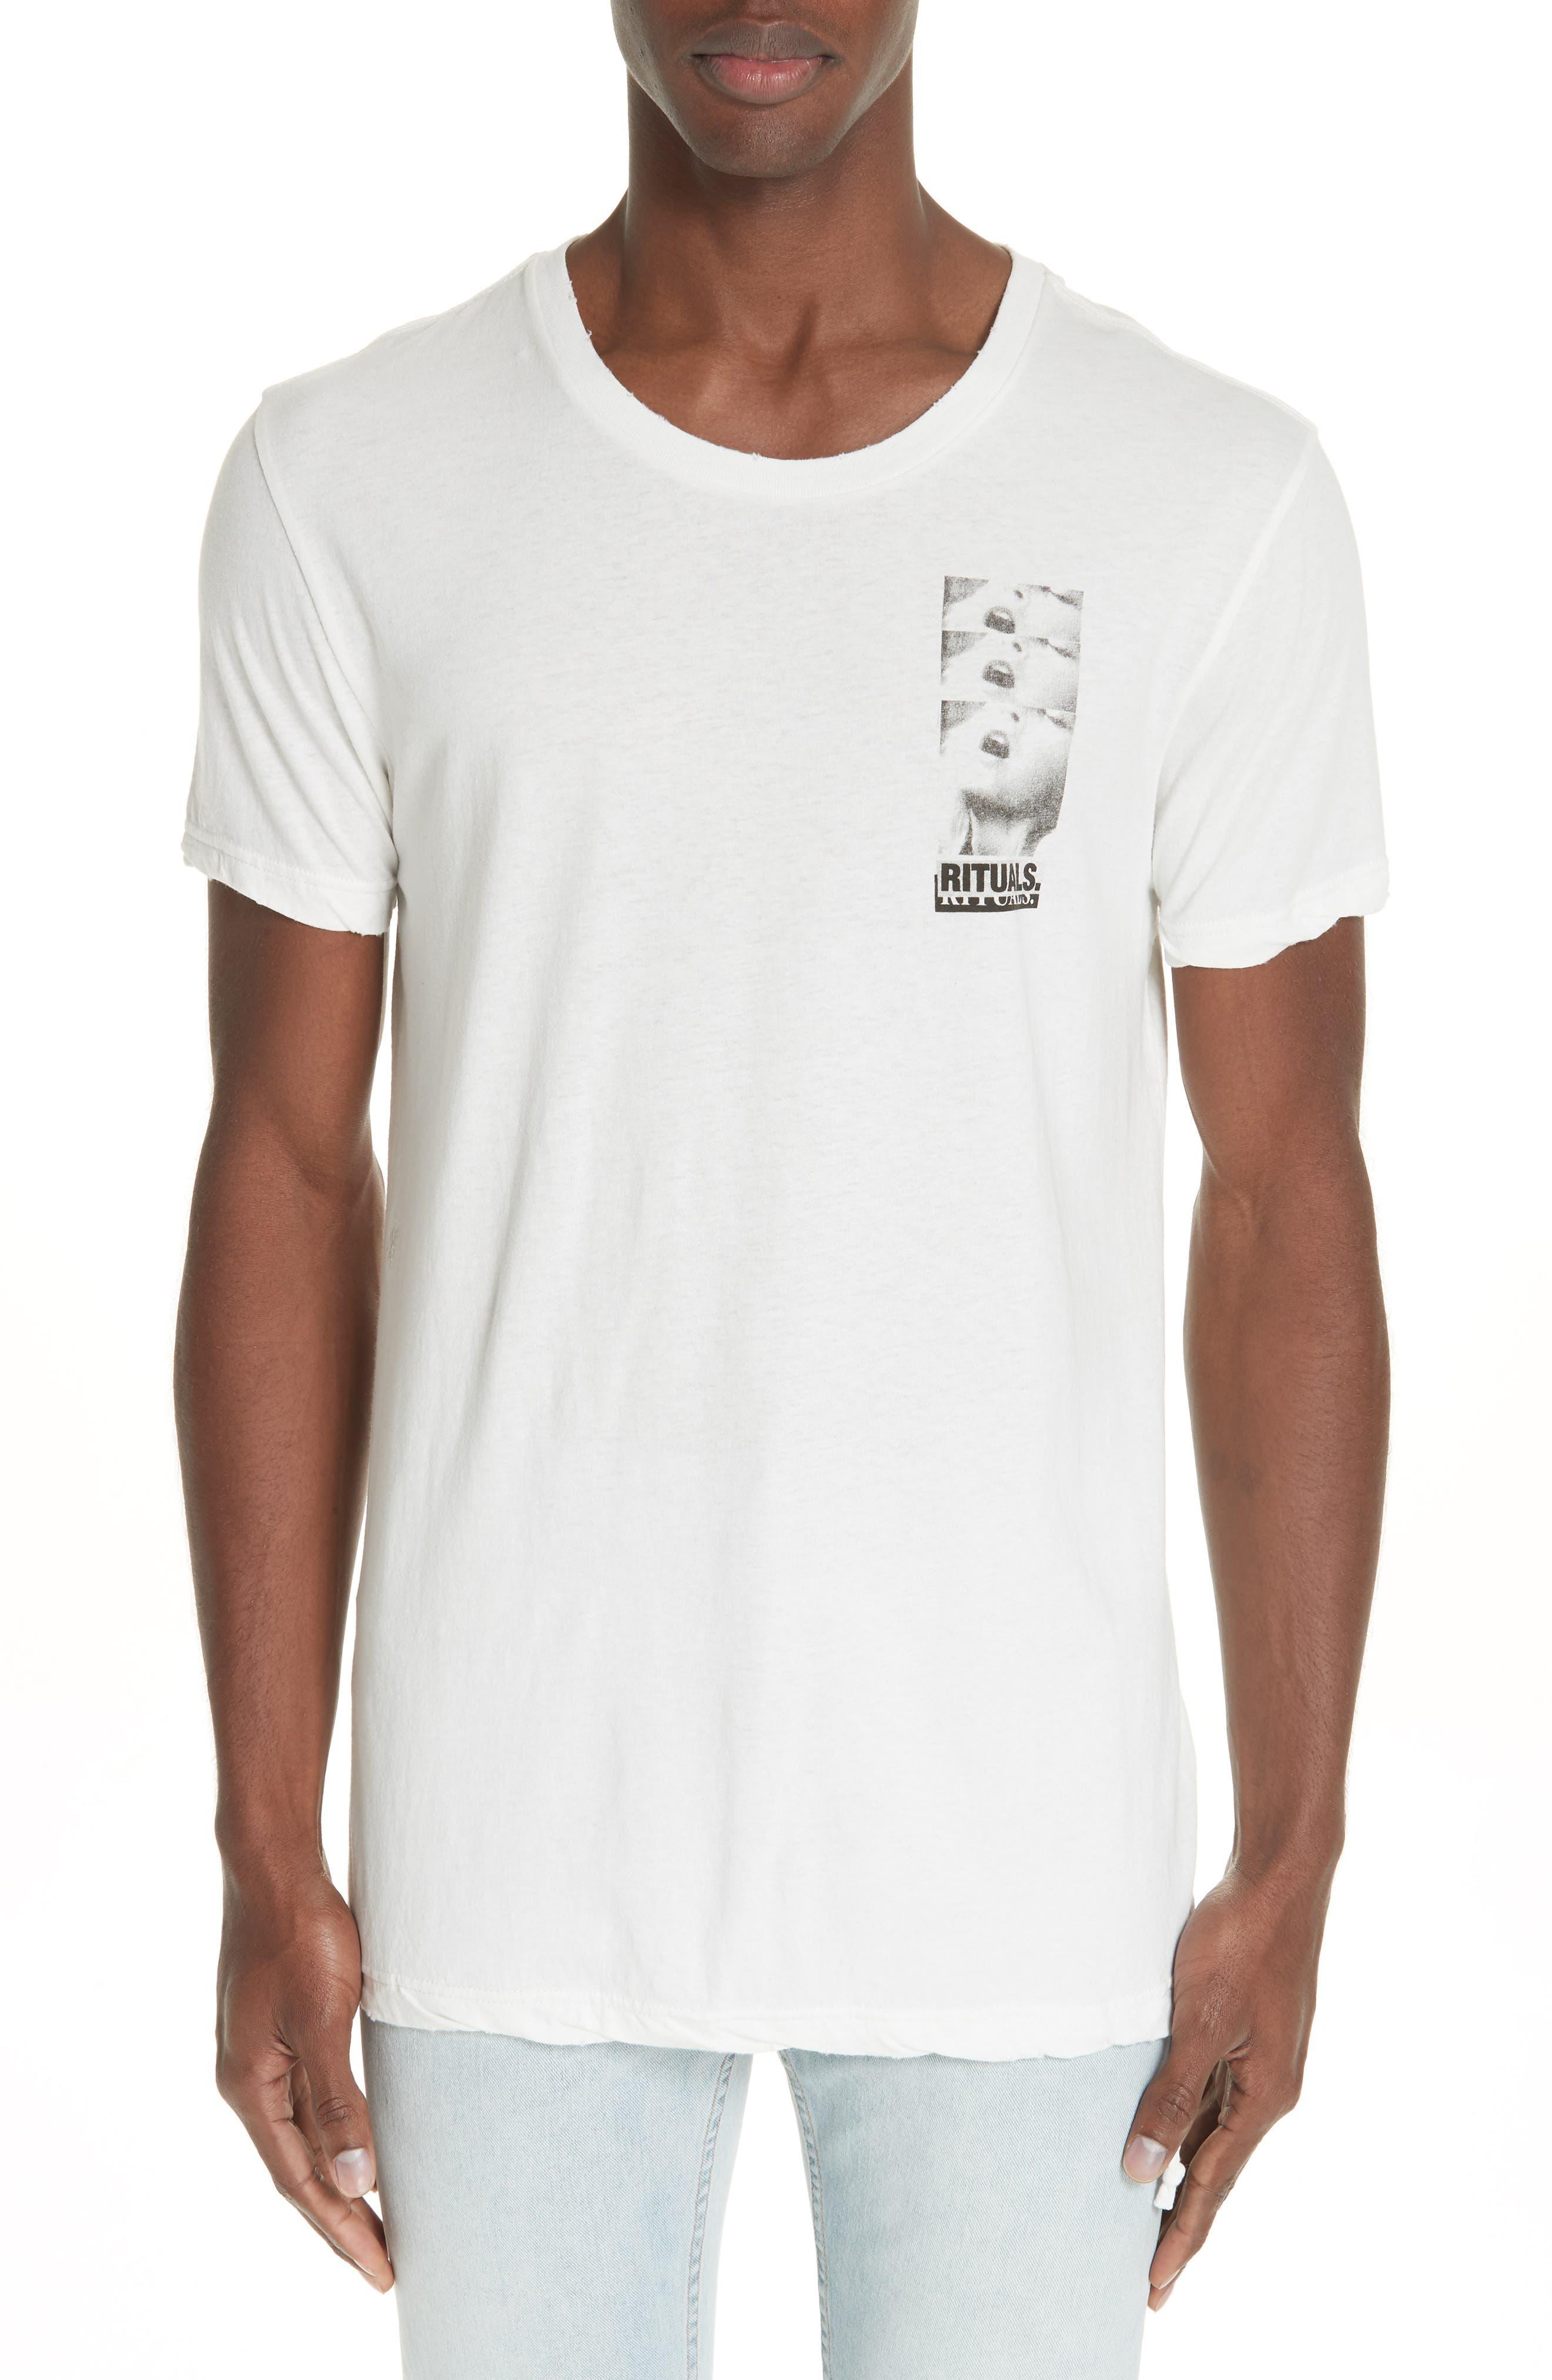 Rituals Graphic T-Shirt,                             Main thumbnail 1, color,                             WHITE